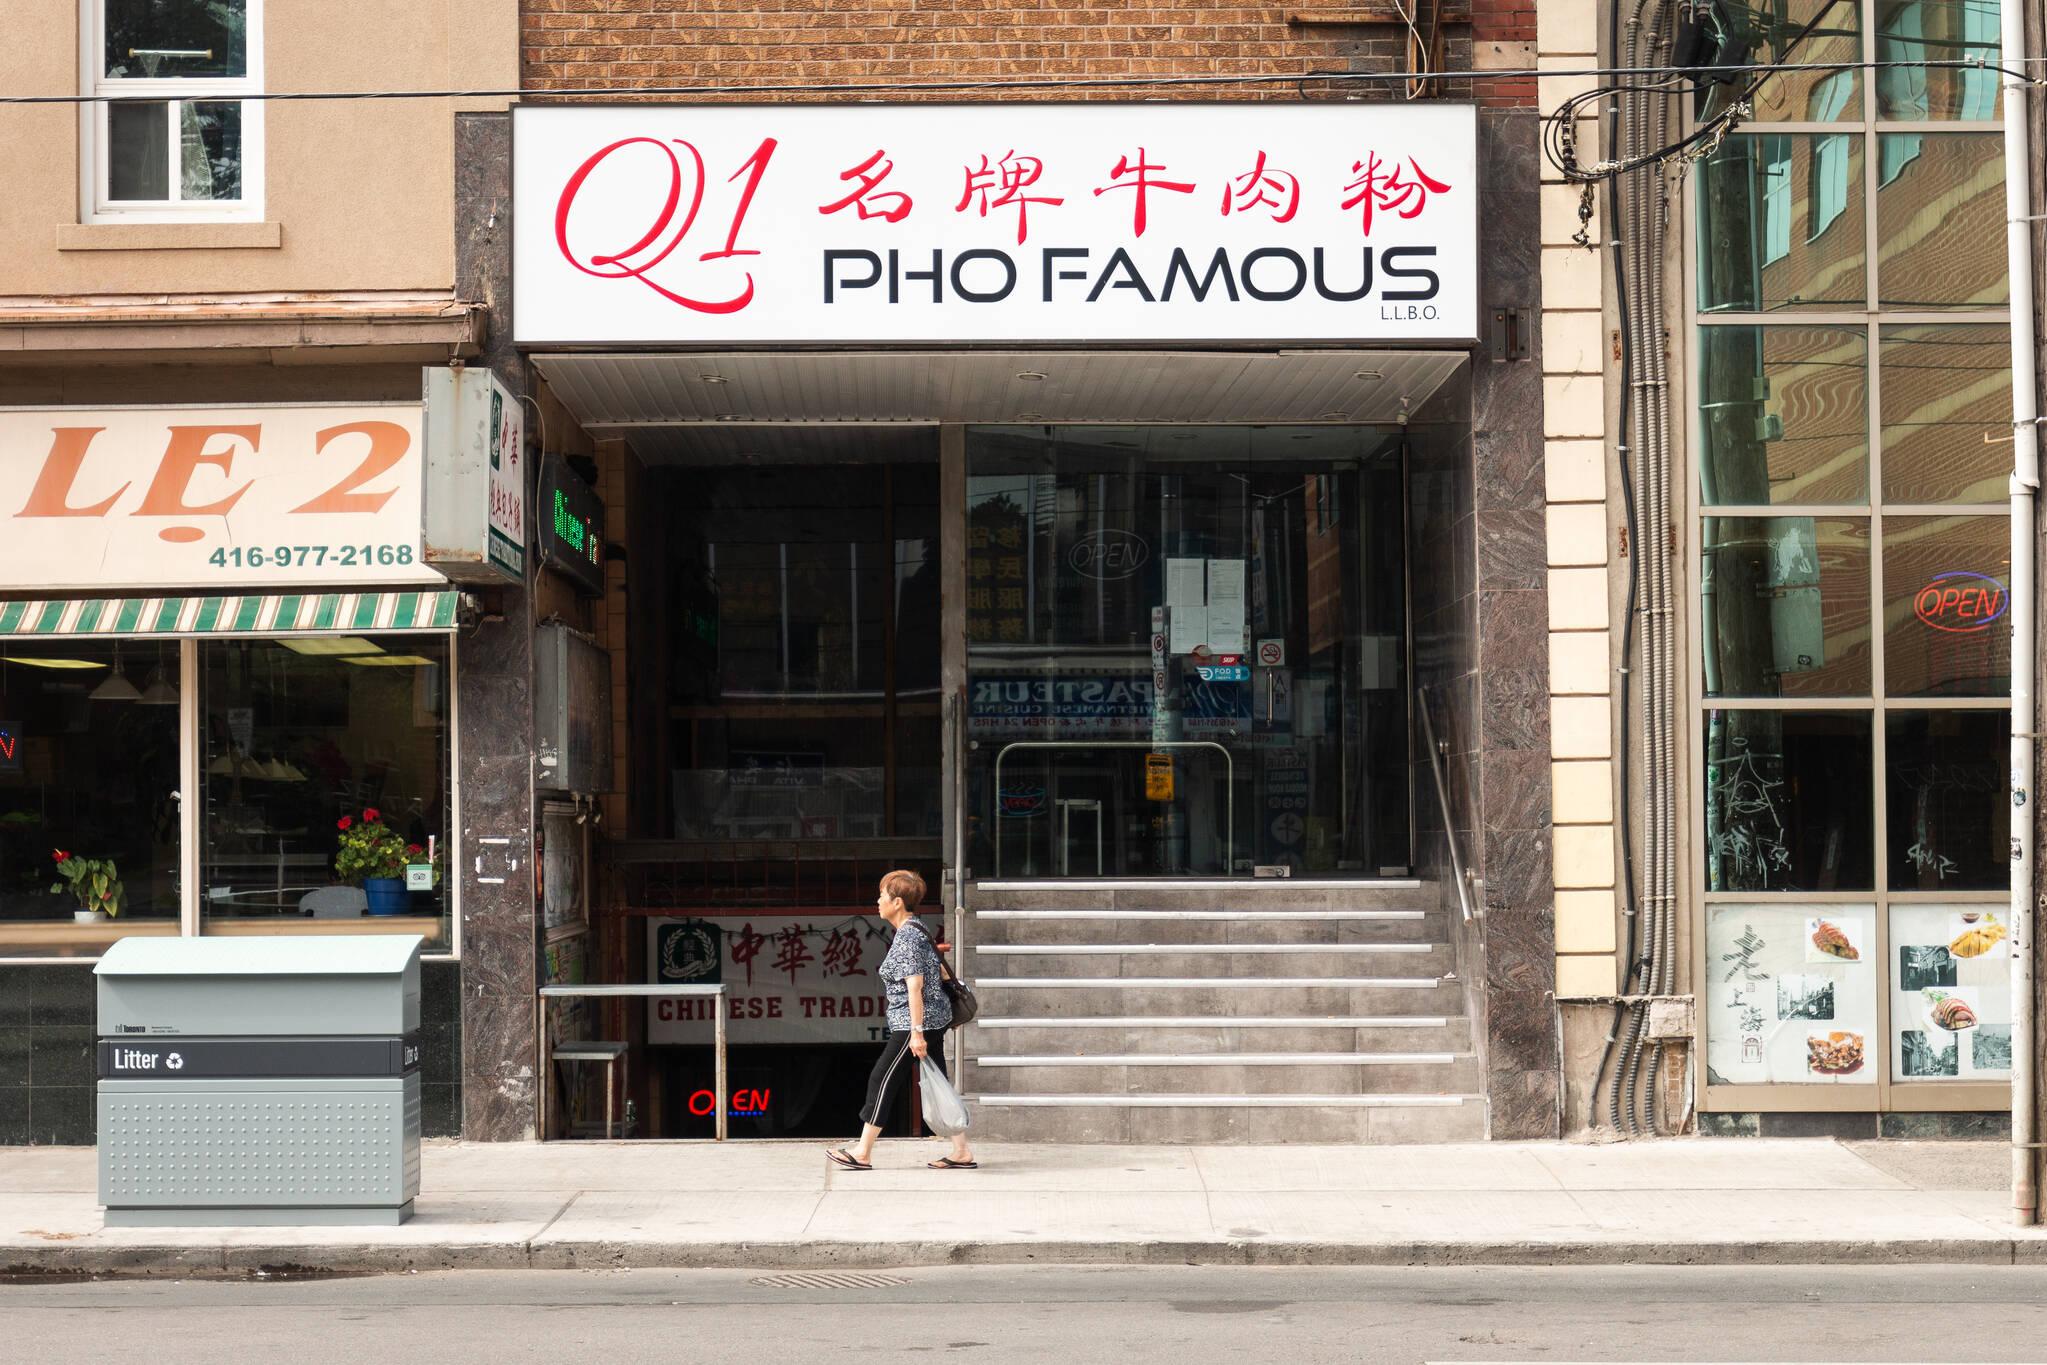 Q1 Pho Famous Toronto